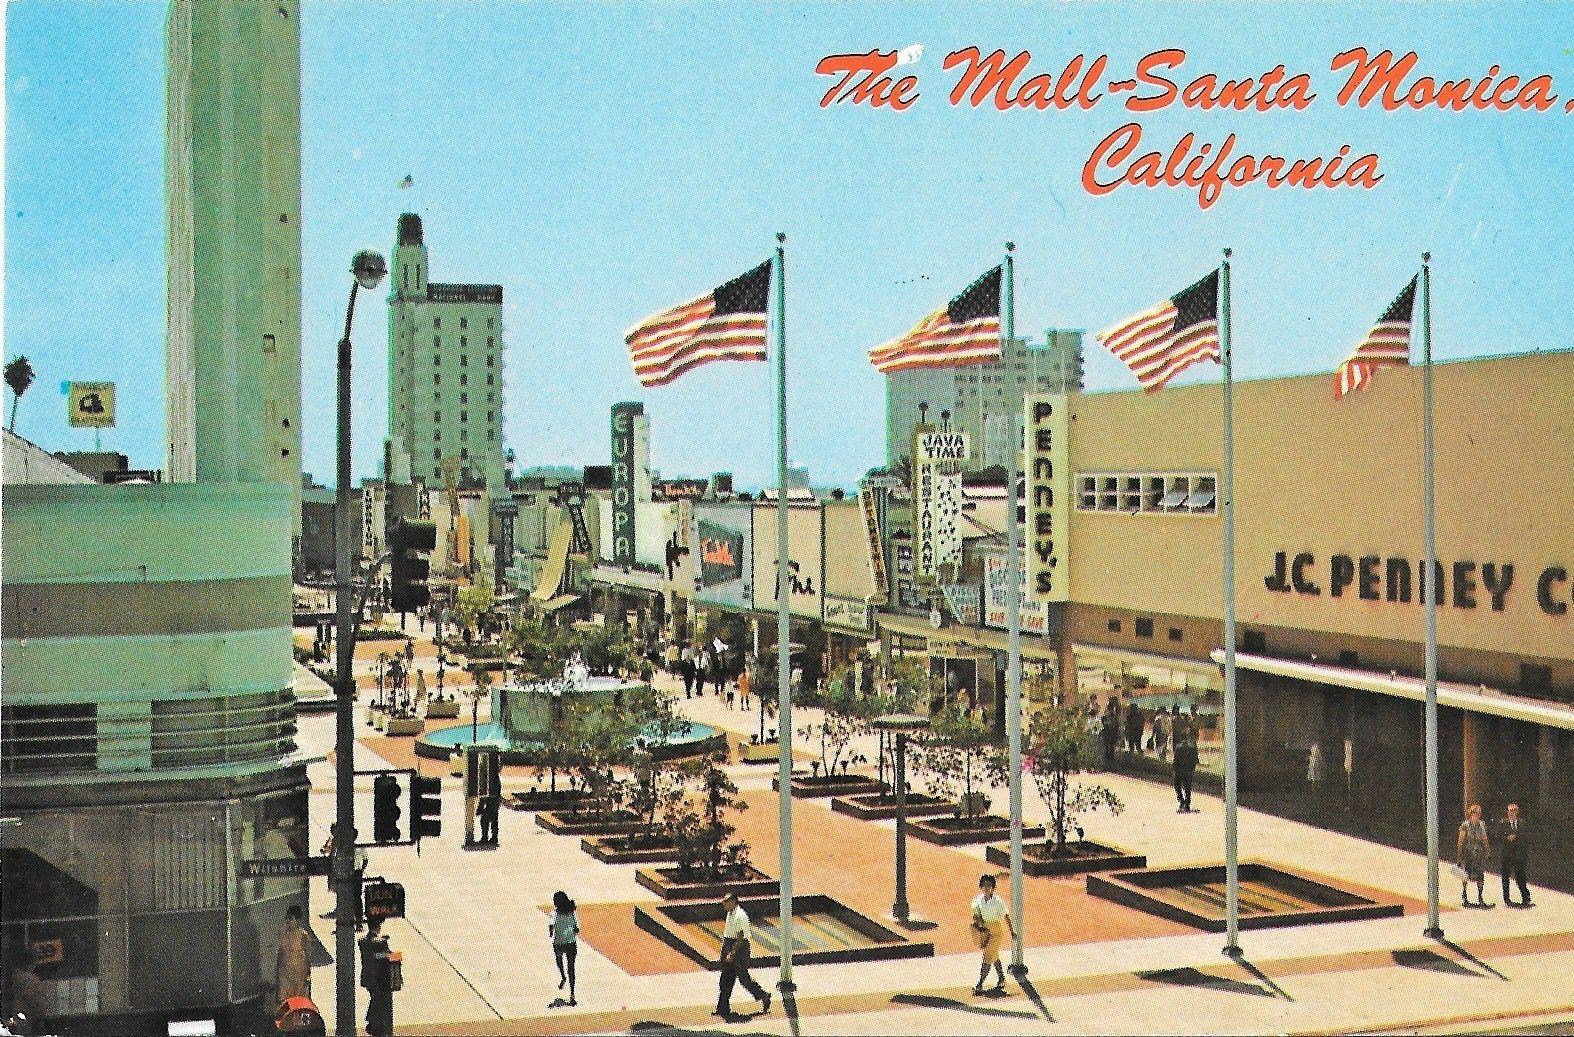 Pin by Susie Denis on Santa Monica & Venice 1970's & 80's